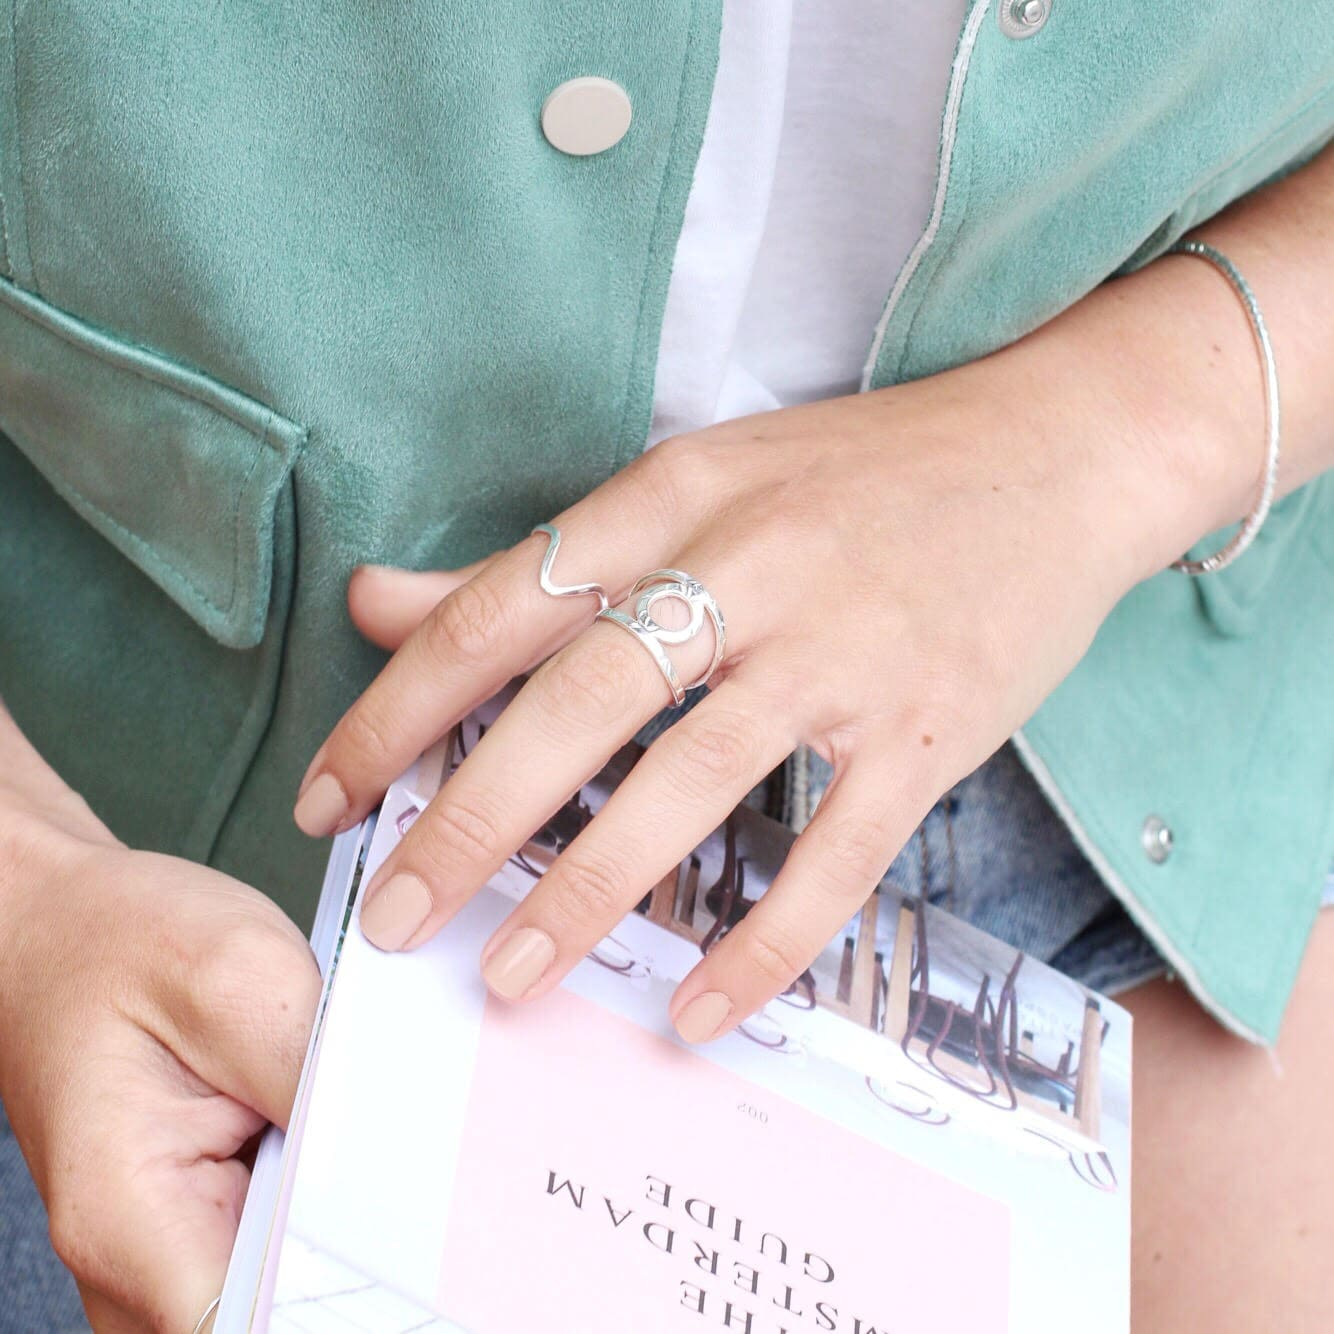 anillo de plata para la oficina, martelie barcelona, comprar anillos de plata baratos, joyasmarket